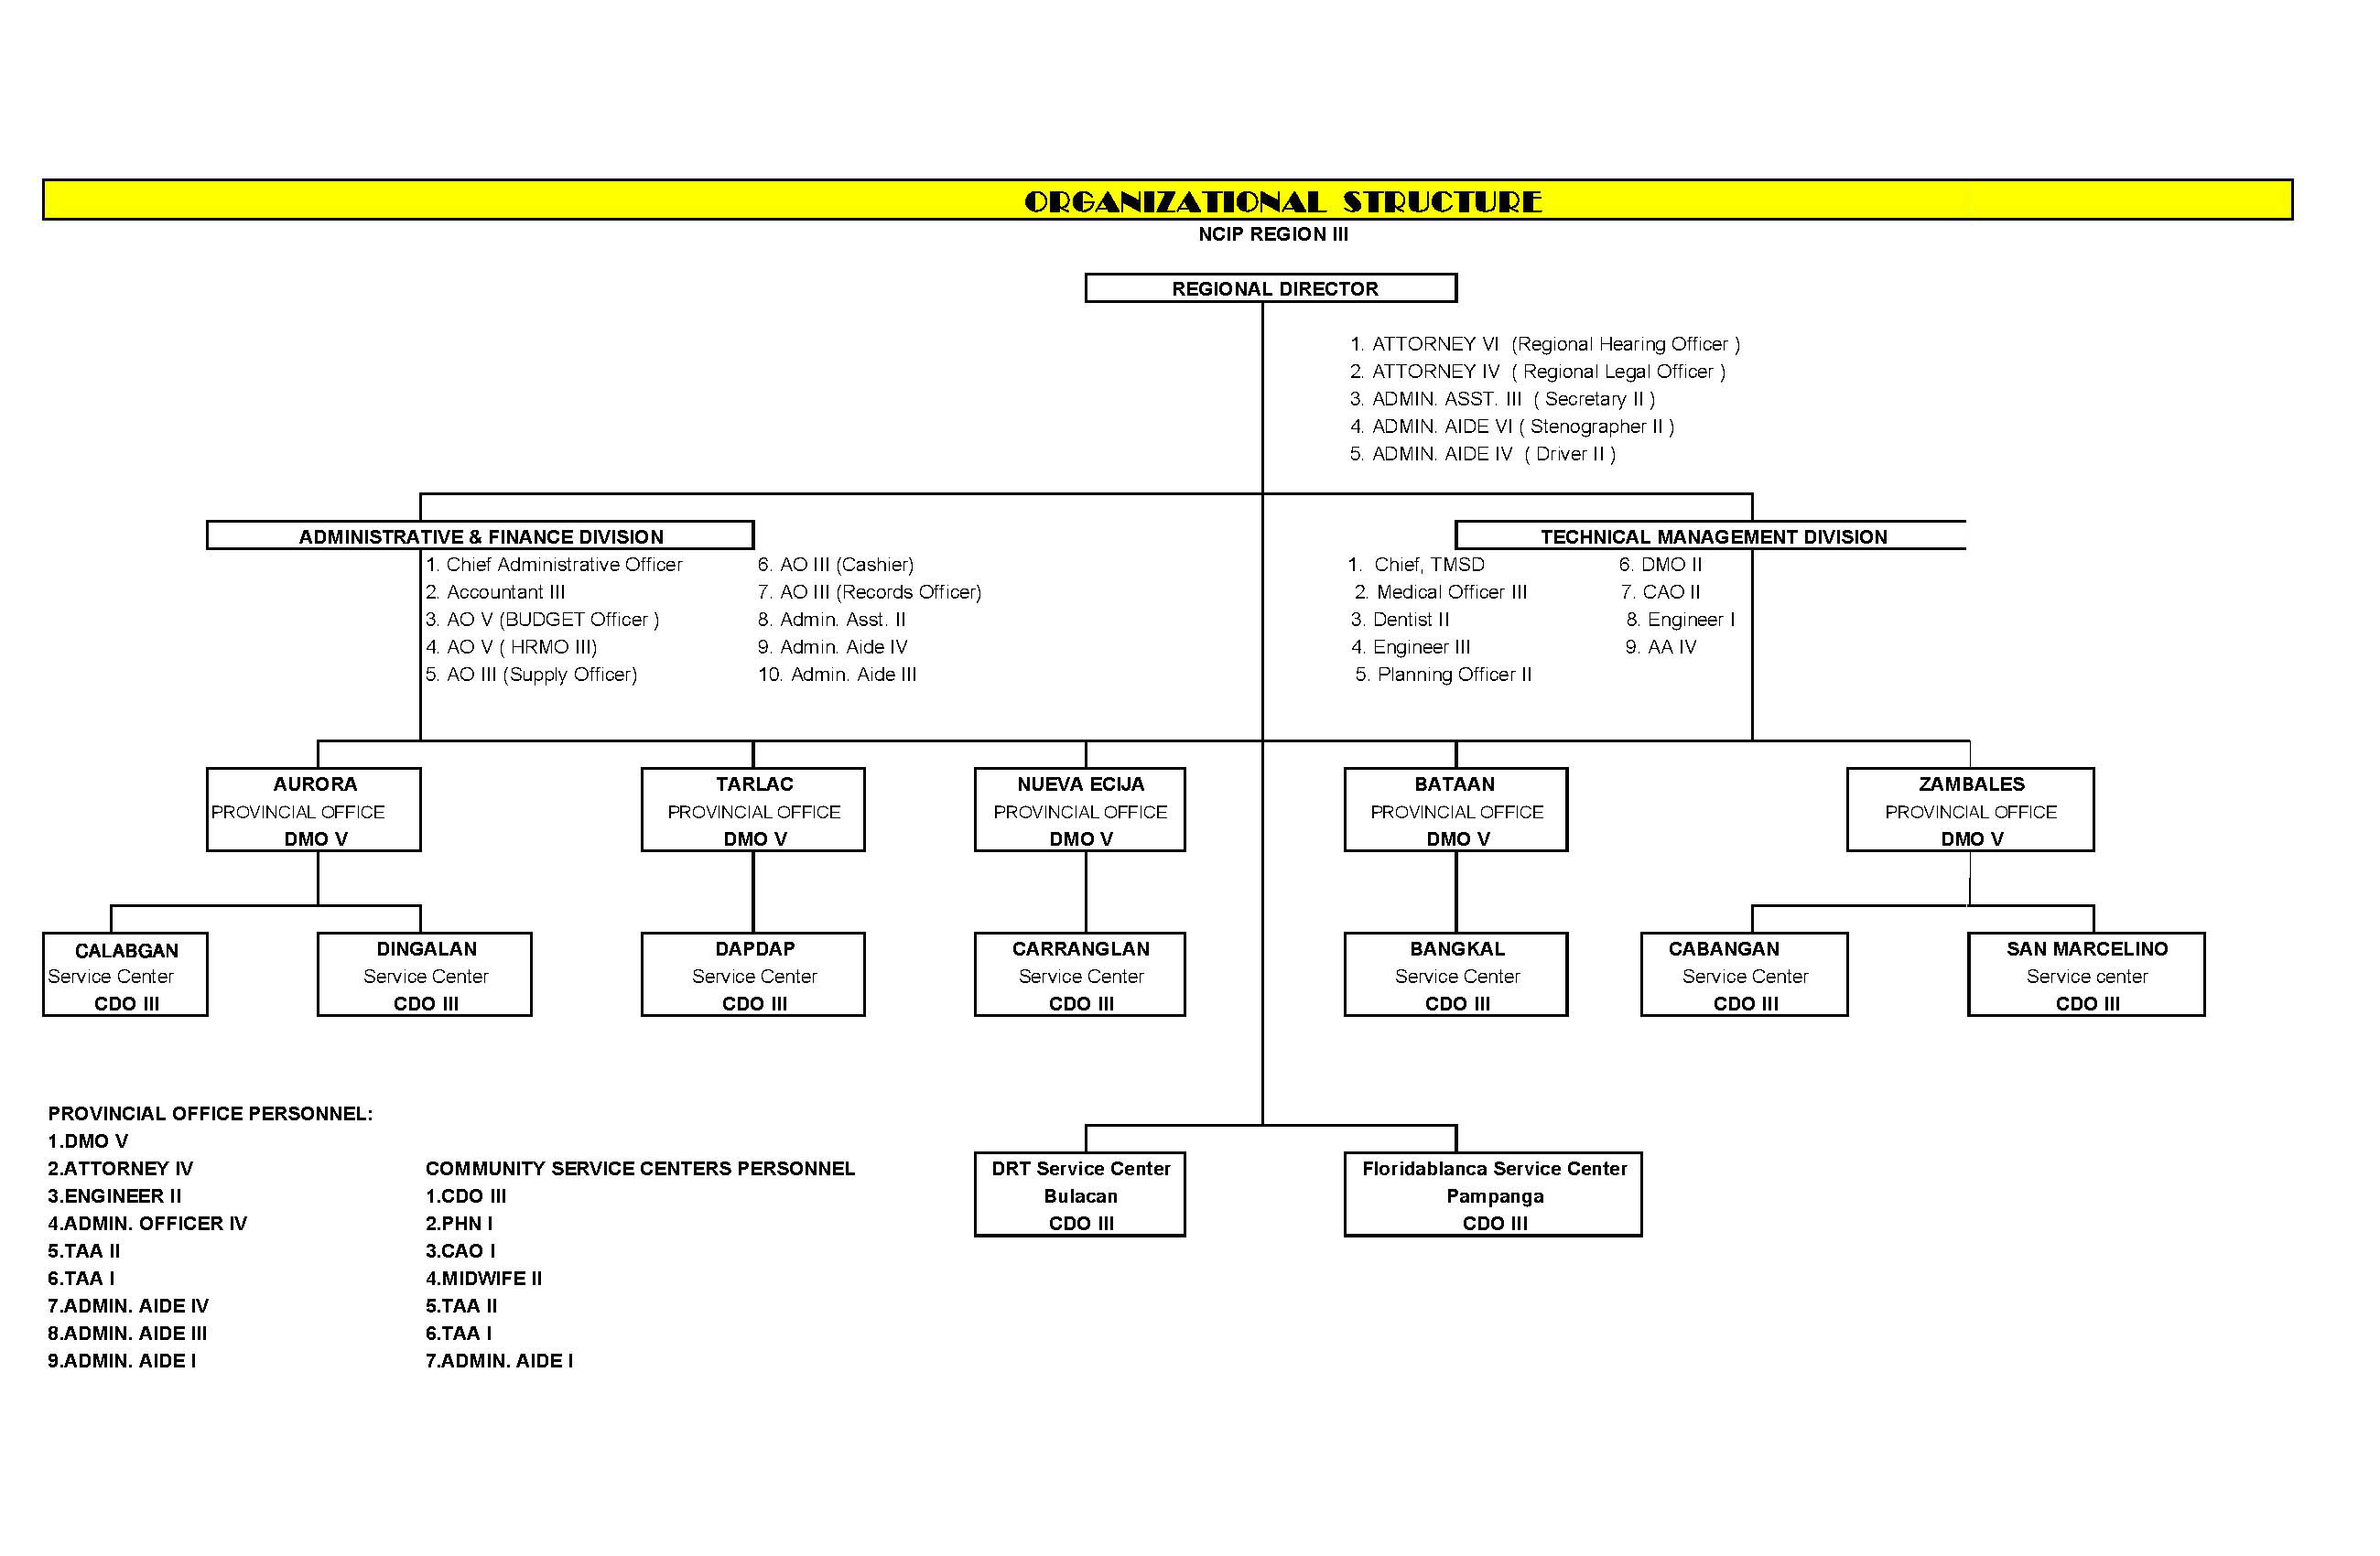 R III Organizational Chart.11.2.15